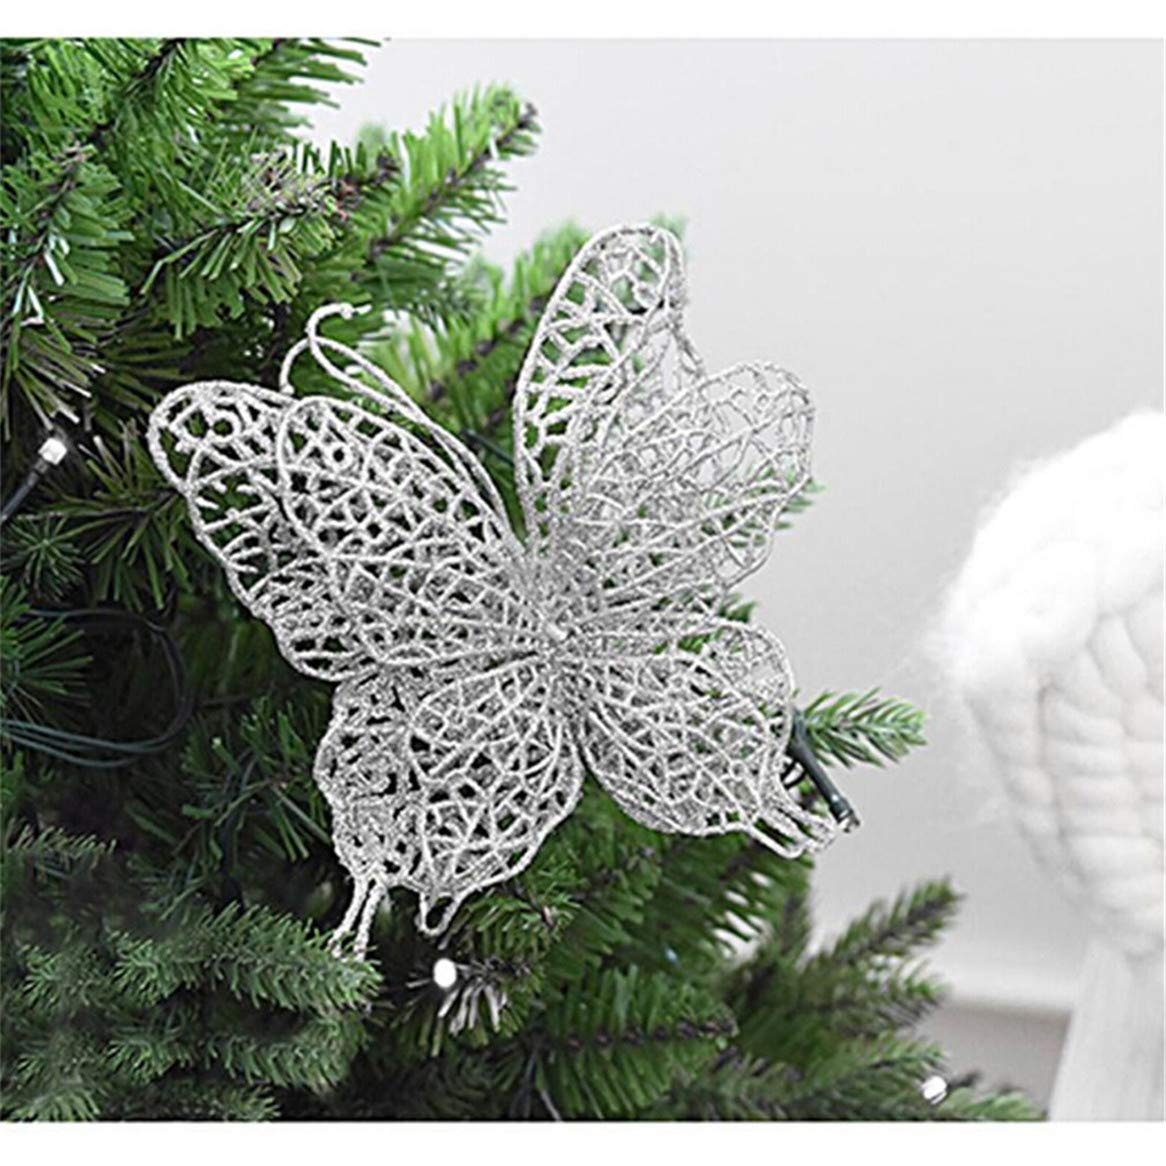 Botreelife 5Pcs Butterfly Christmas Tree Decoration Christmas Hanging Ornaments Wedding Birthday Party Decor Blue